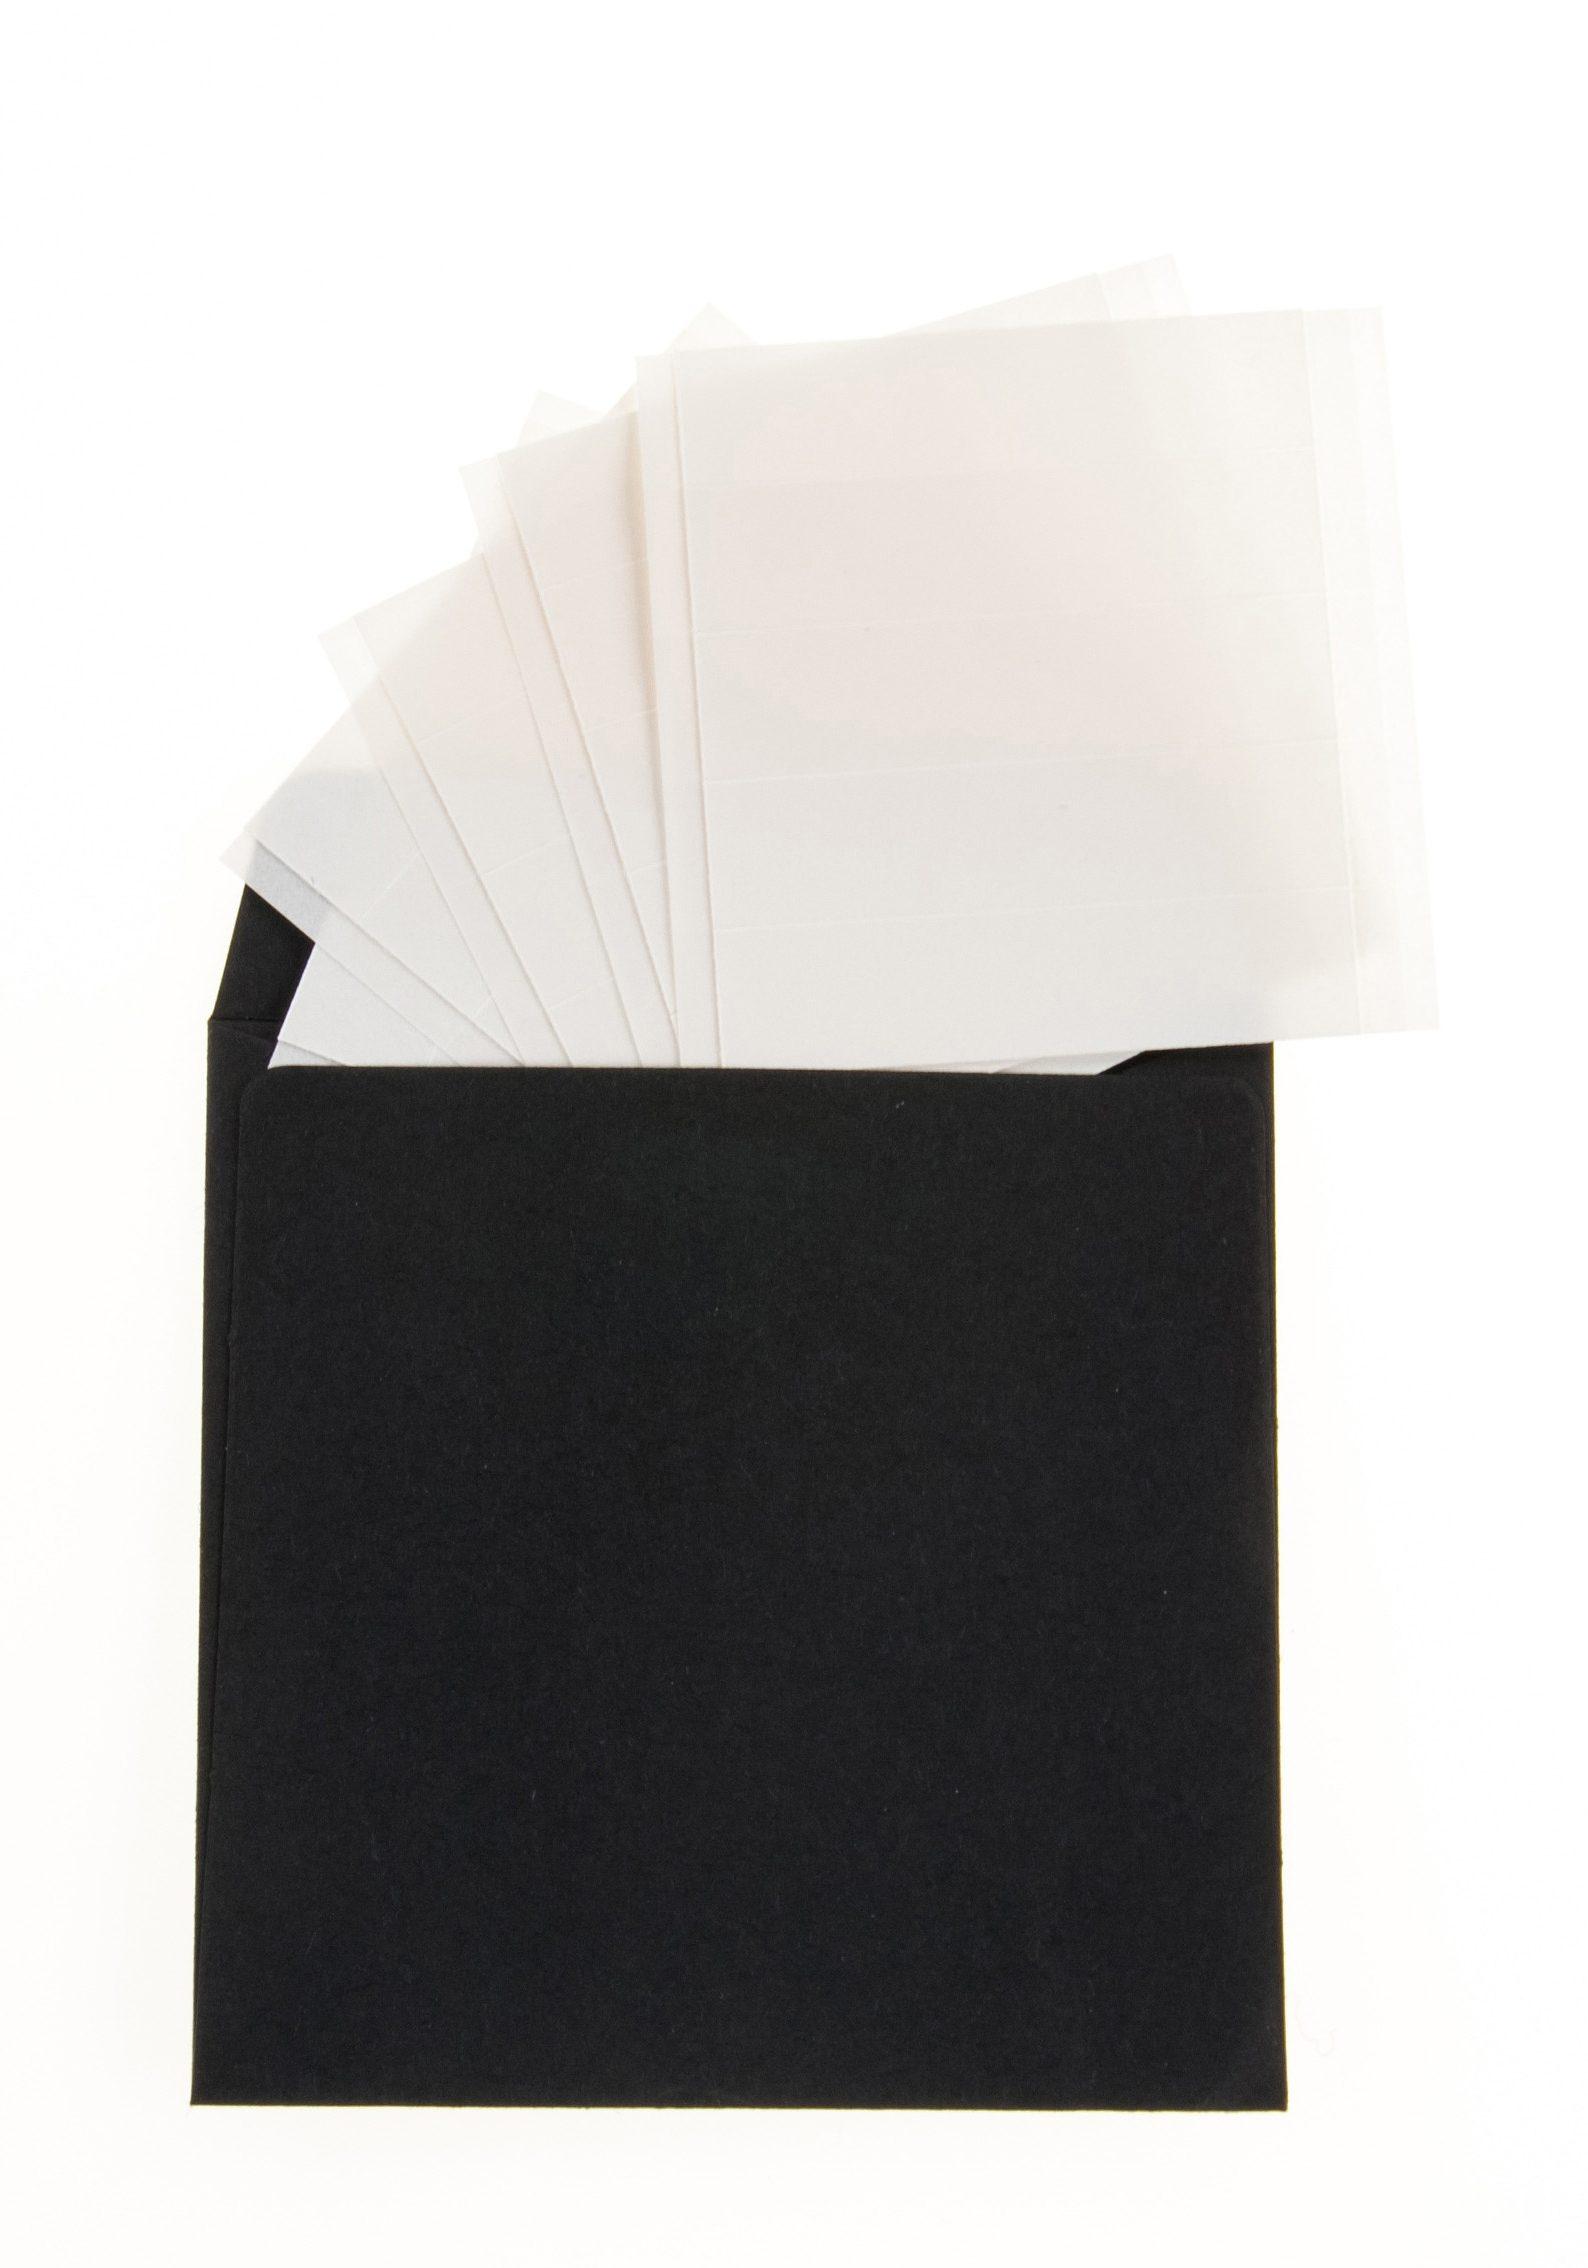 LASCANA Klebestreifen/Haftstreifen/Styling tape